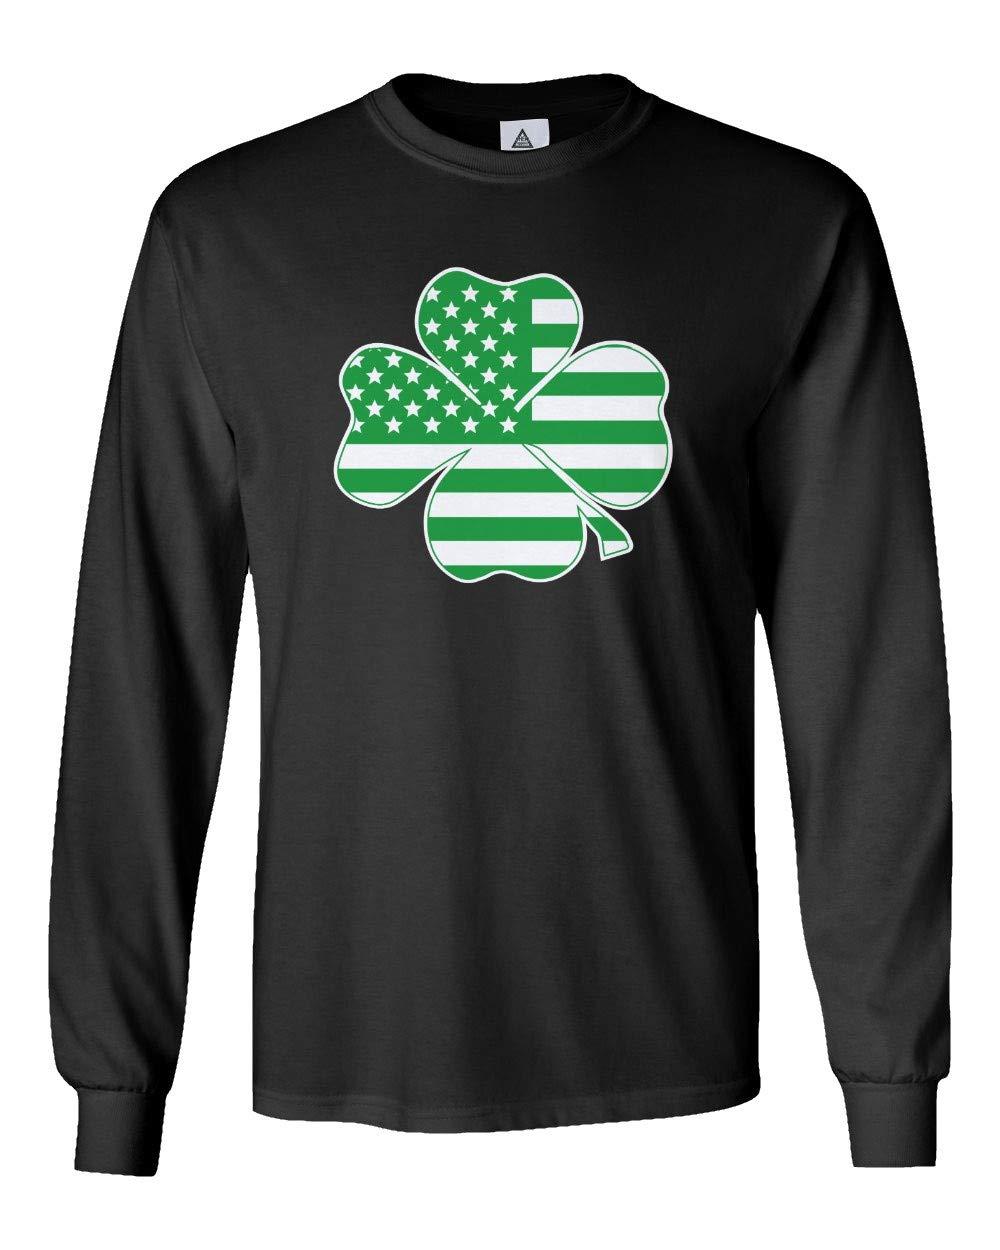 Sheki Apparel Irish American Flag Vintage Shamrock St Patricks Day Men's Shirts